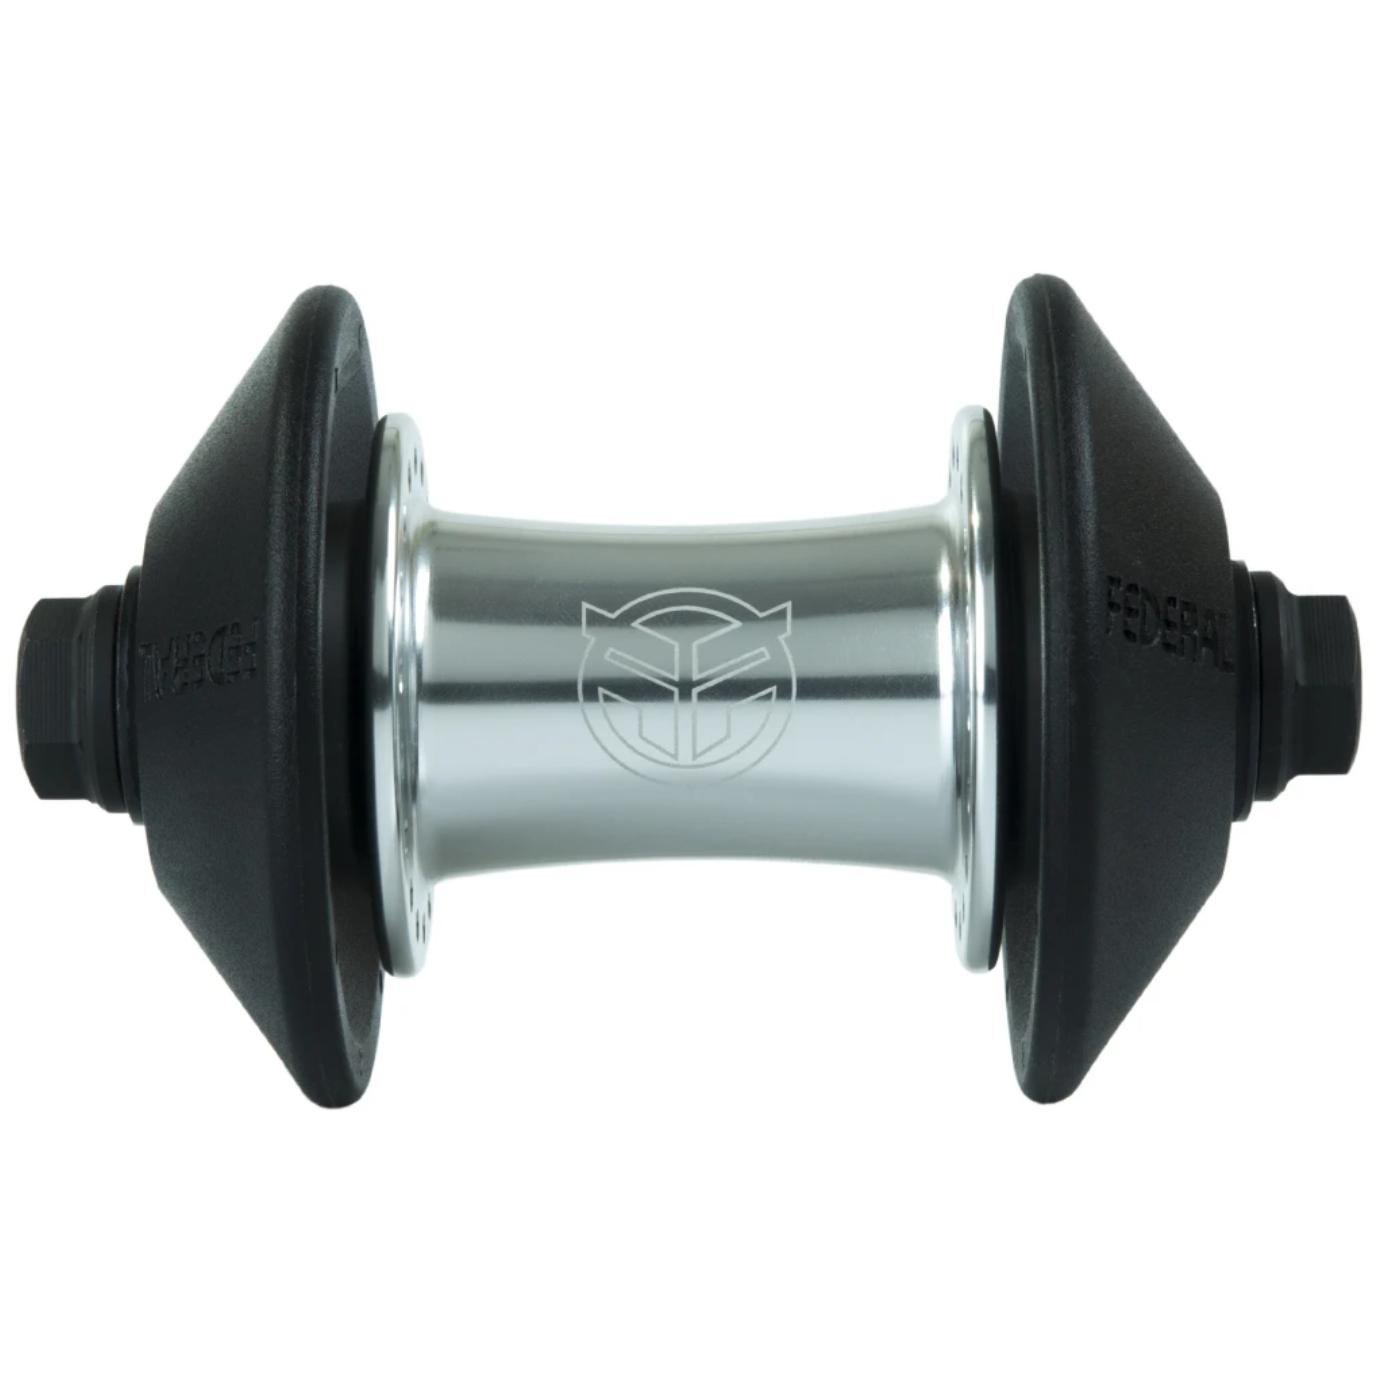 BMX Втулка Передняя Federal Stance Pro Серебряная